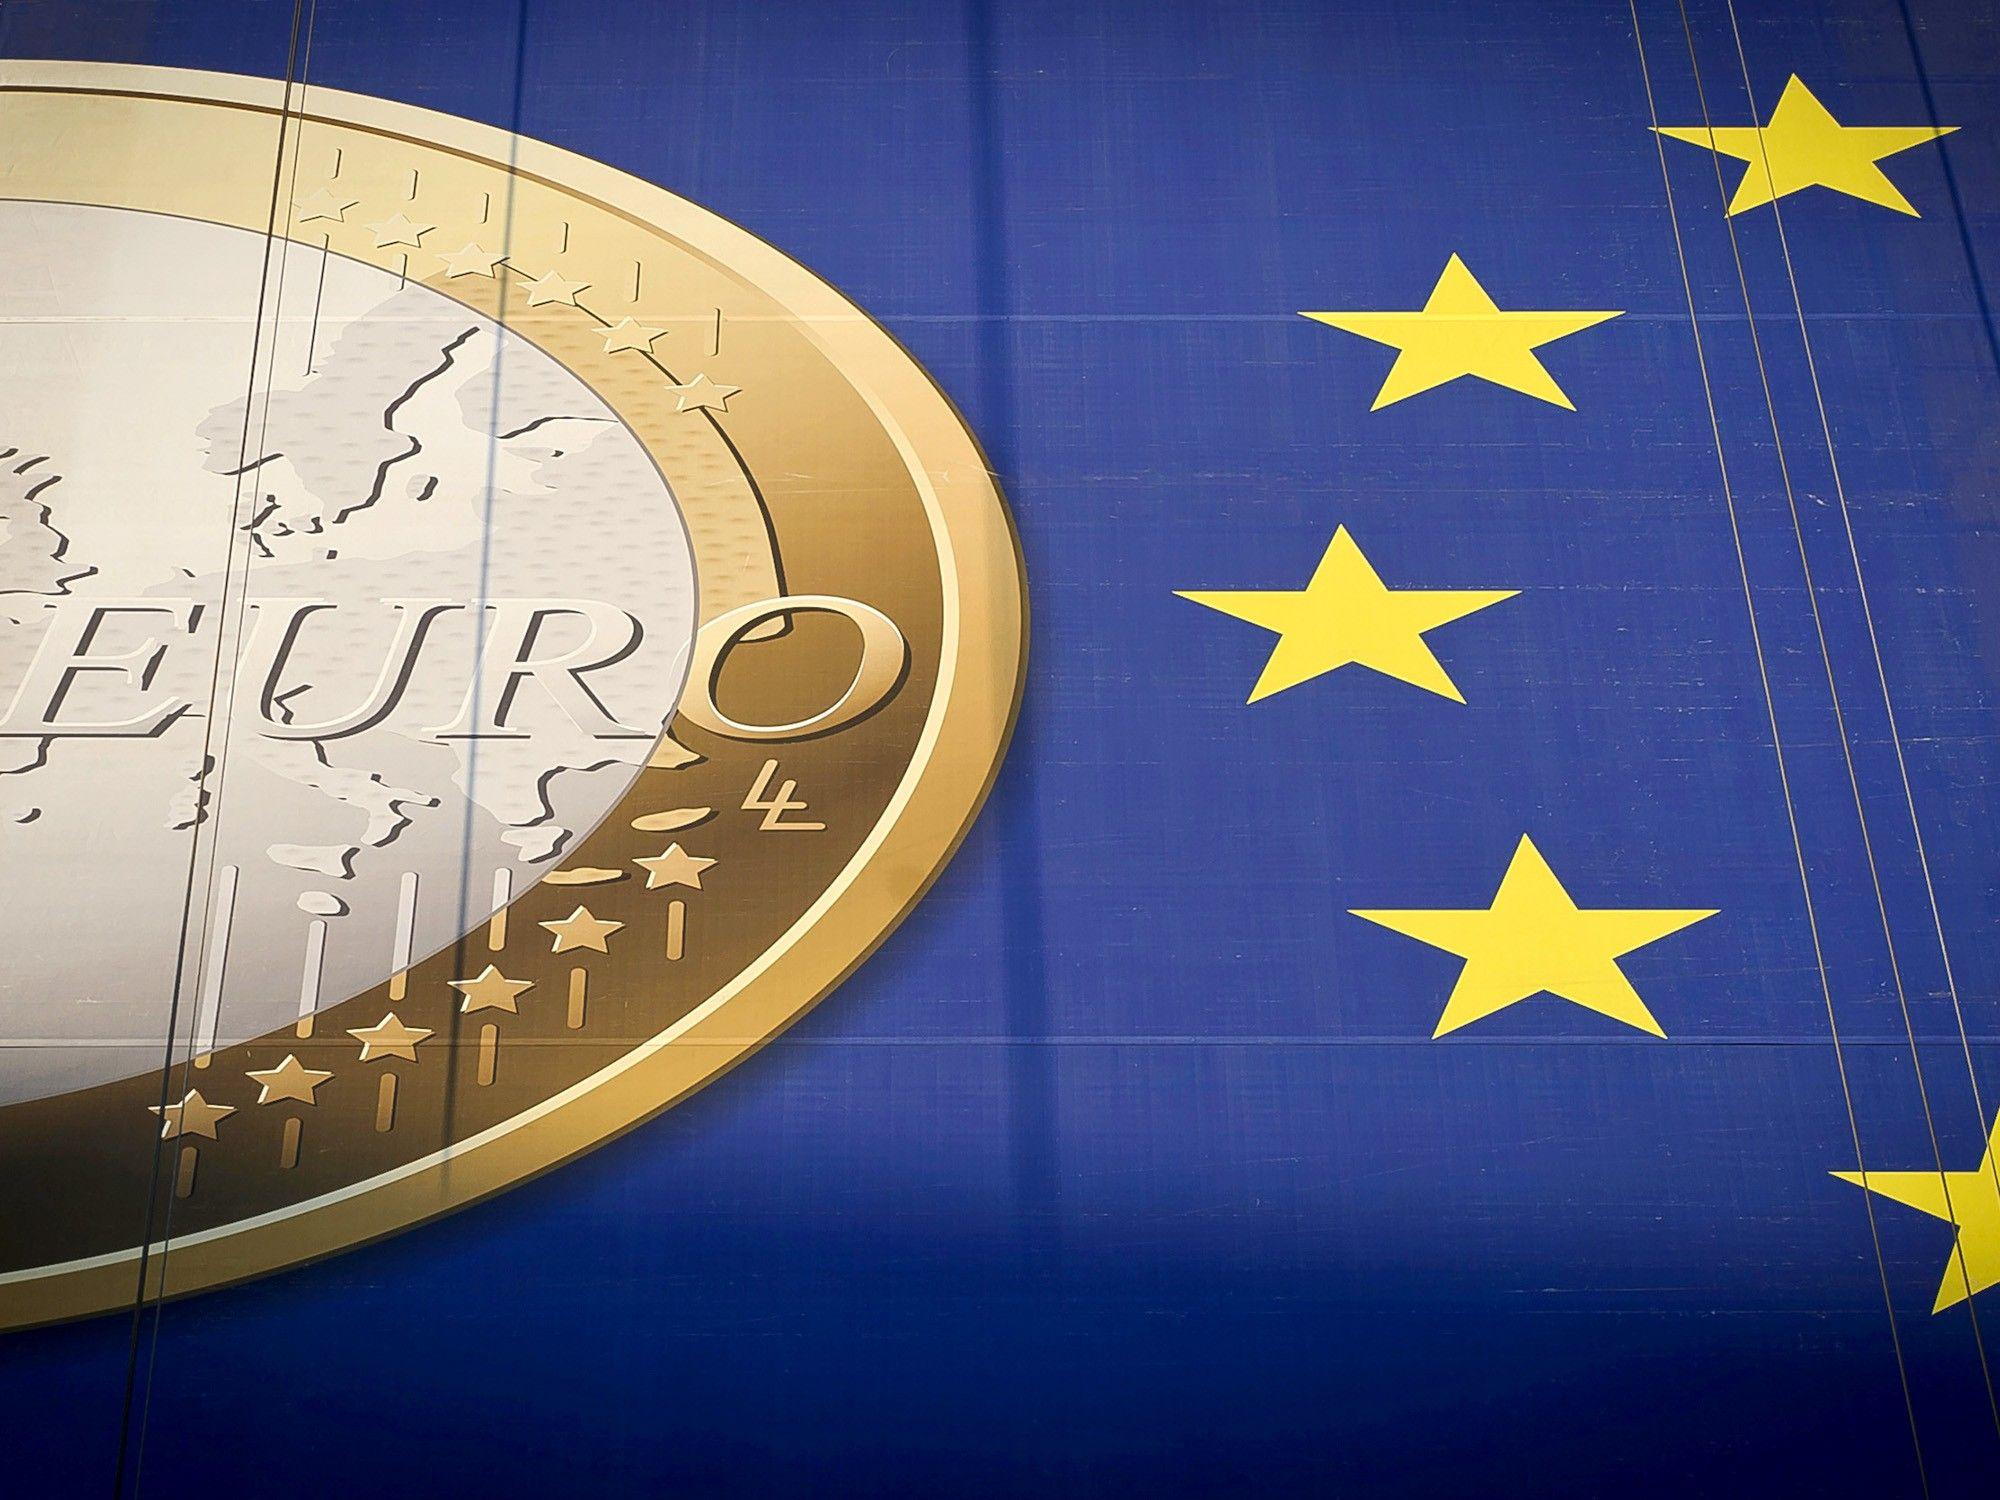 La eurozona da la pelea con crecimiento superior a pronósticos